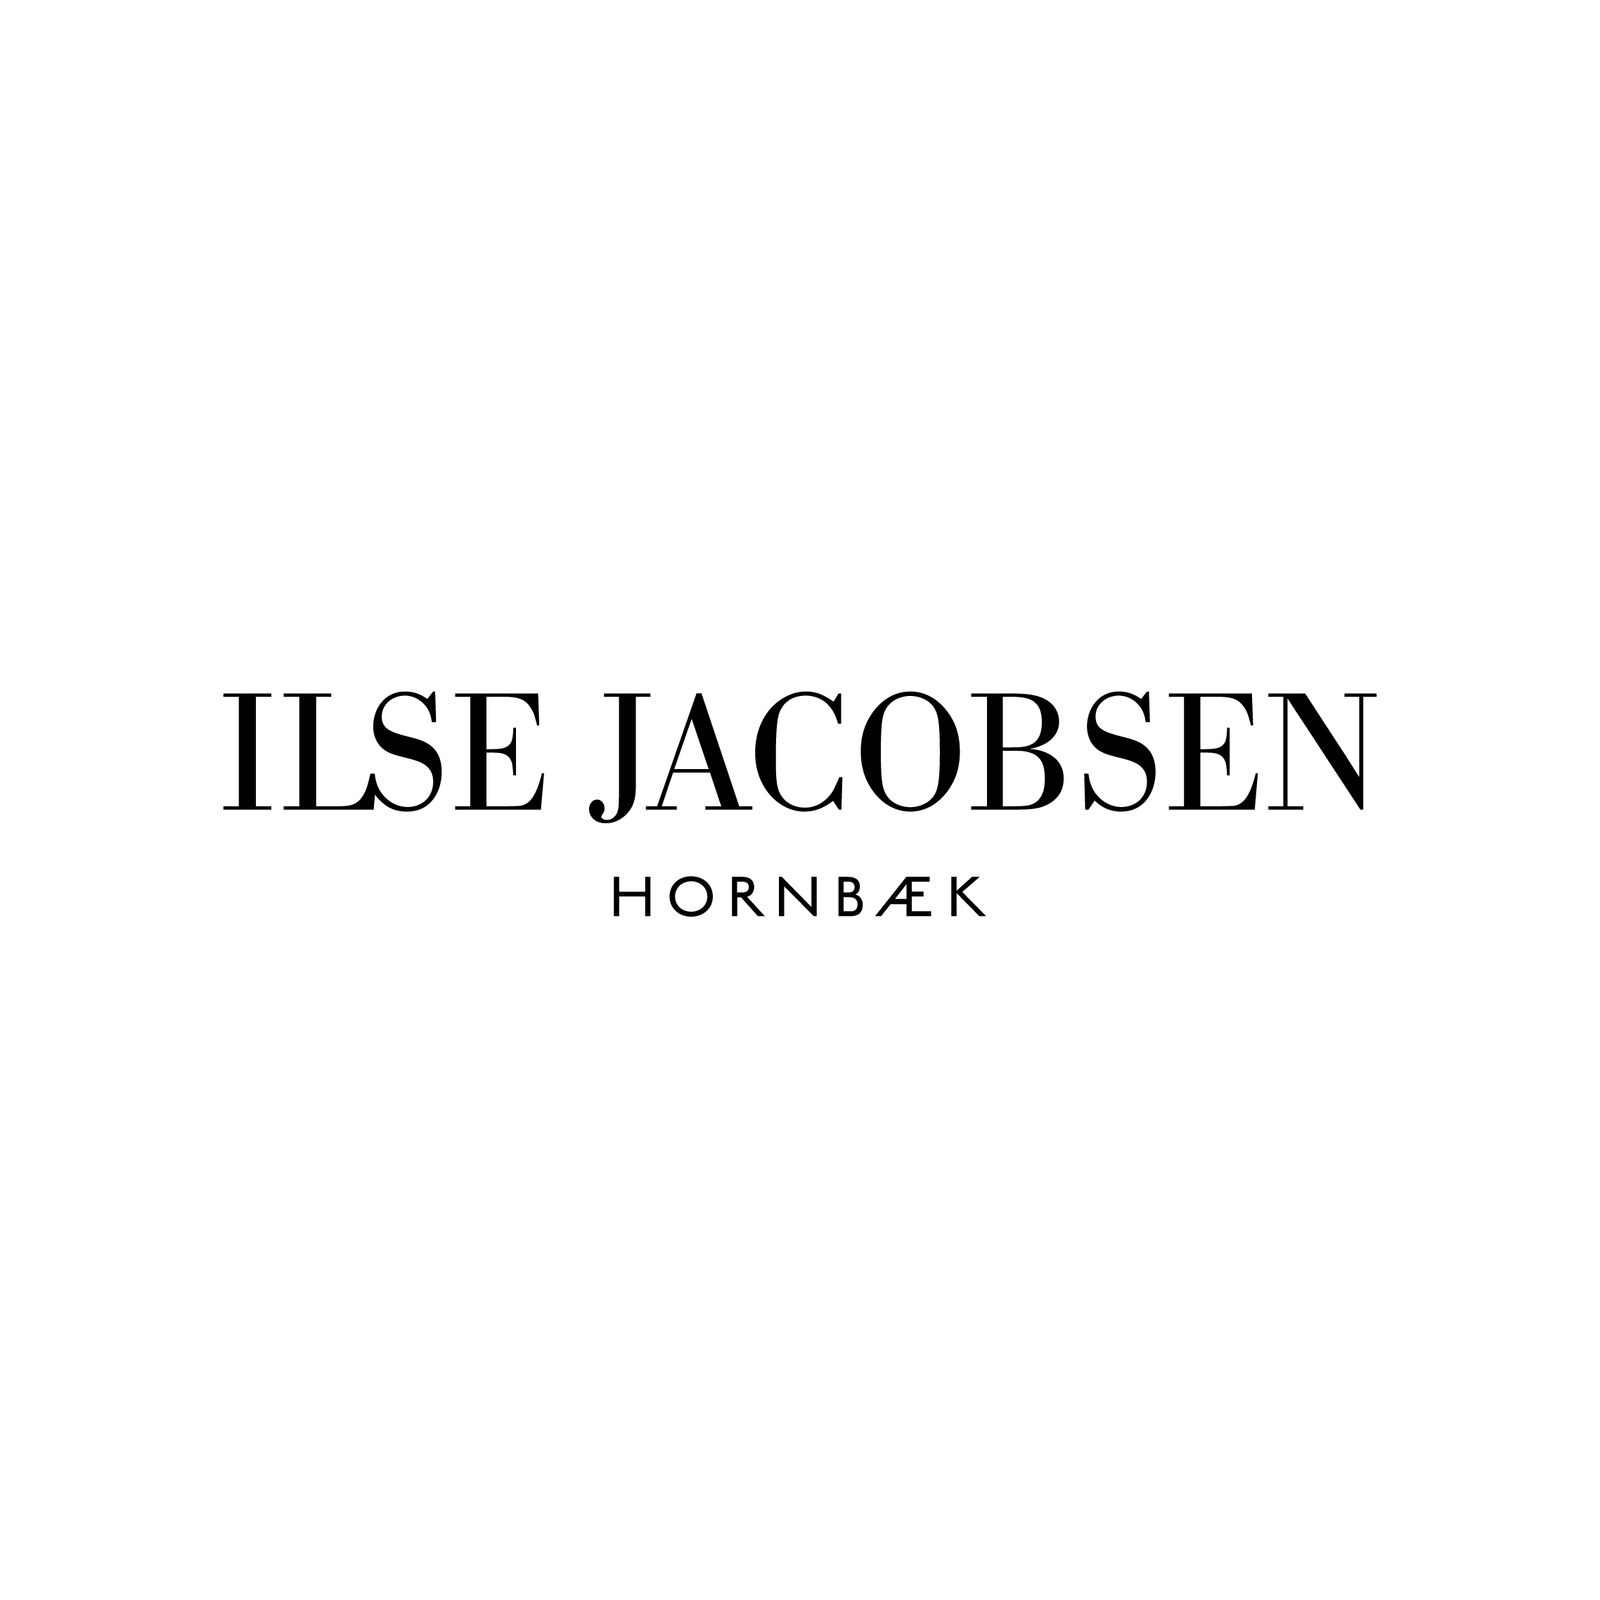 ILSE JACOBSEN Hornbæk (Image 1)